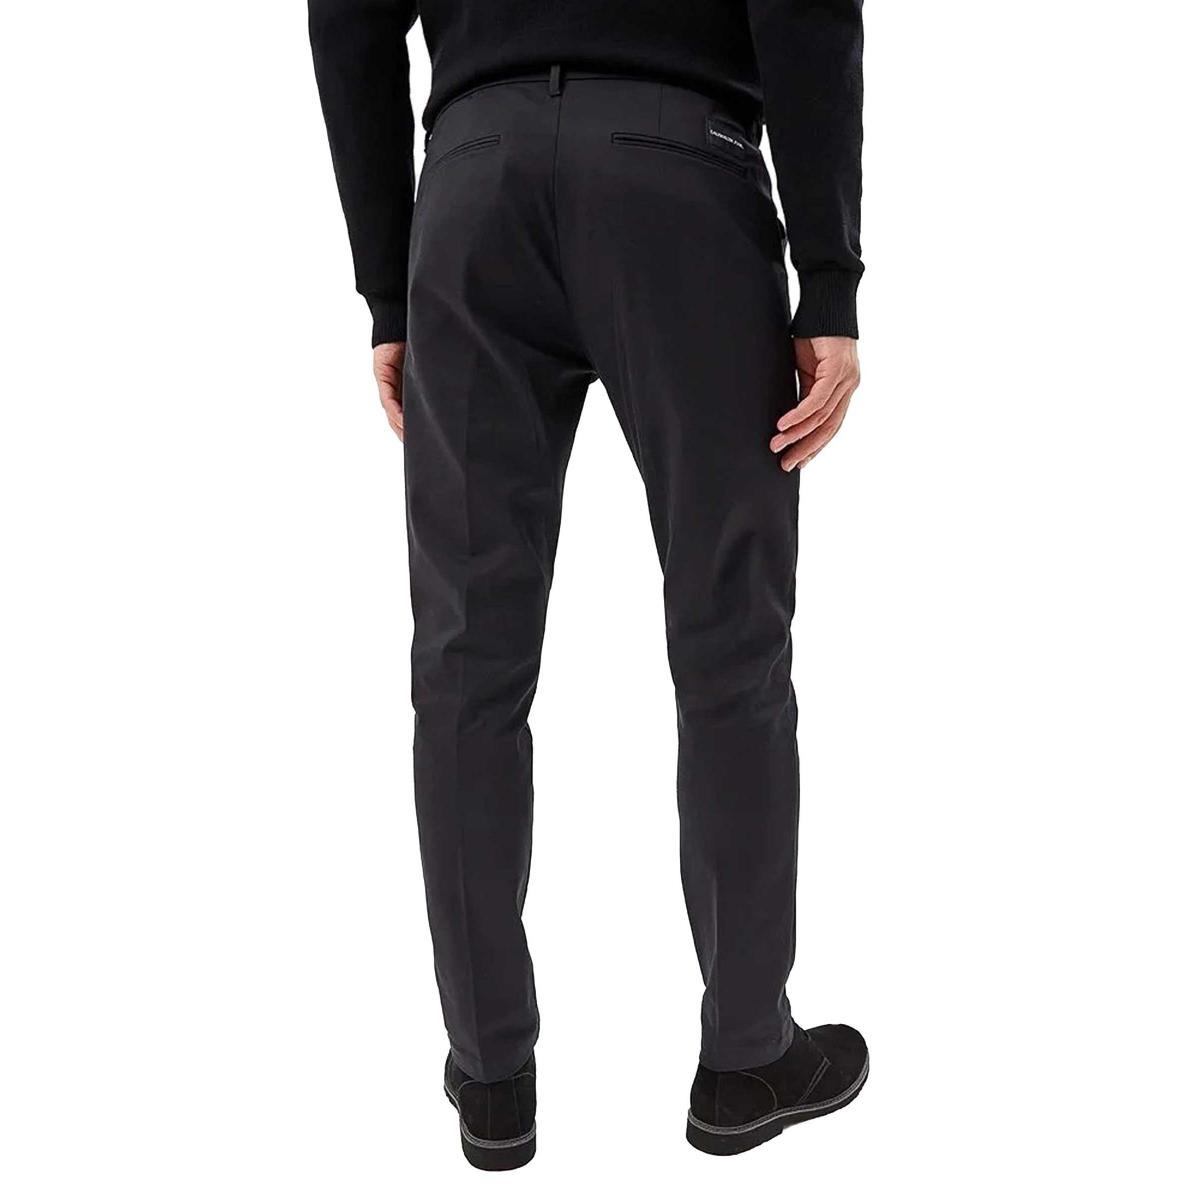 Pantaloni Calvin Klein Jeans CKJ 026 SLIM CHINO da uomo rif. J30J312638